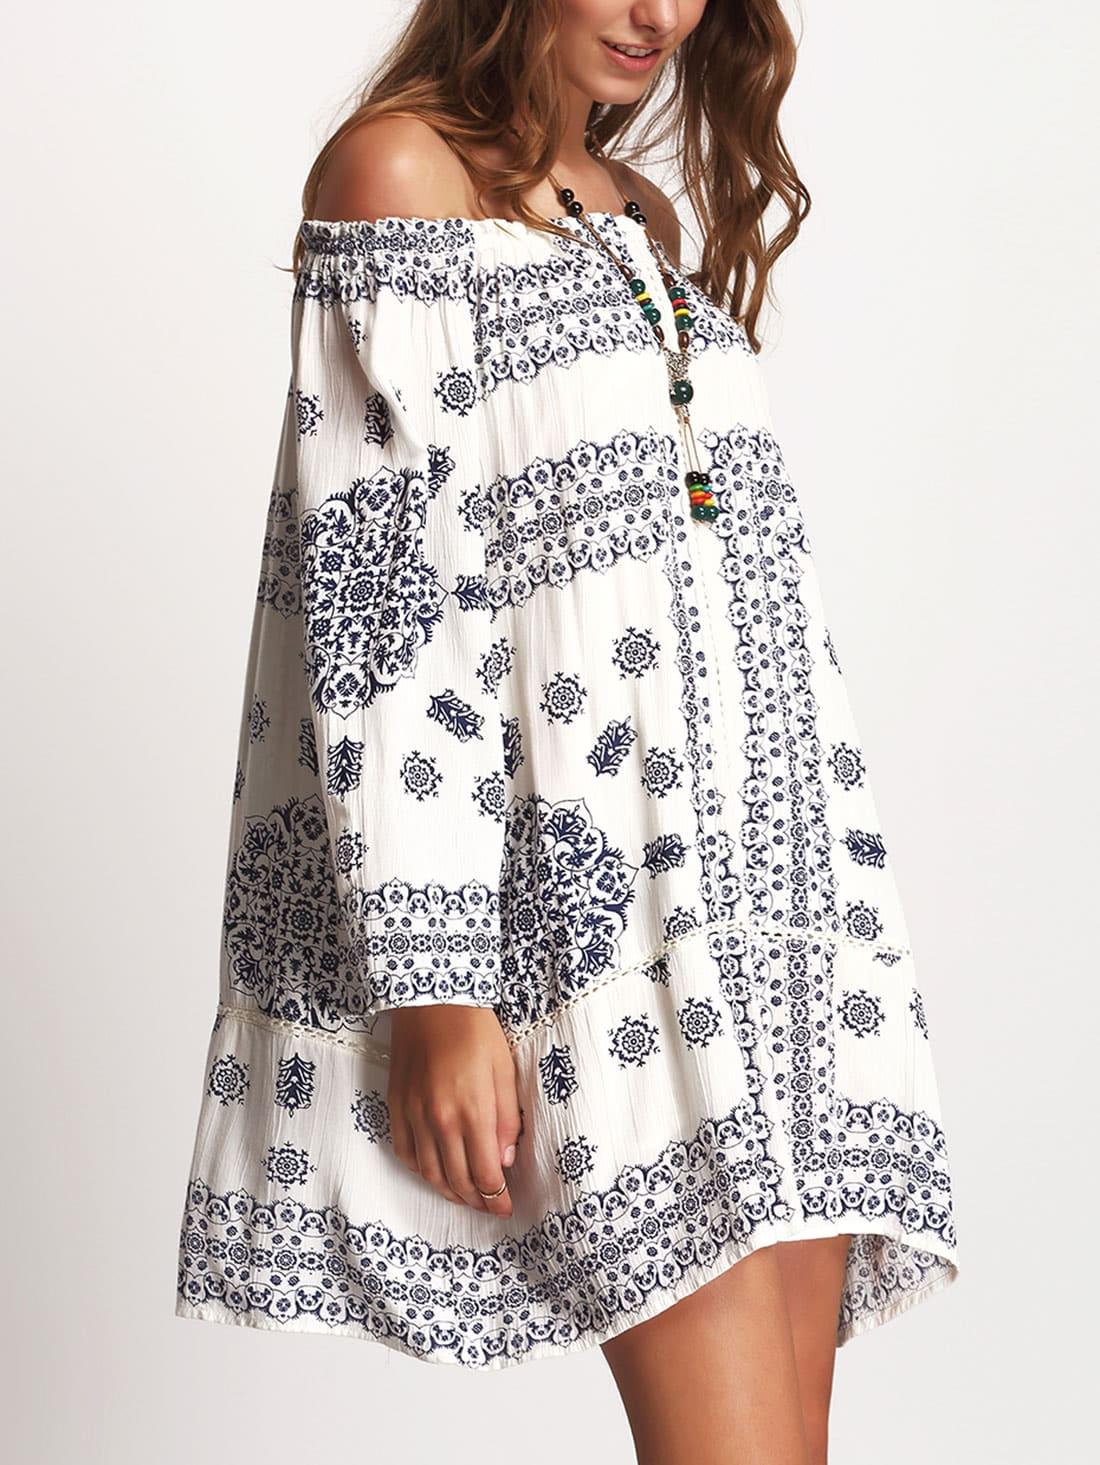 Blue Print Off Shoulder Crochet Insert DressBlue Print Off Shoulder Crochet Insert Dress<br><br>color: White<br>size: L,M,S,XL,XS,XXL